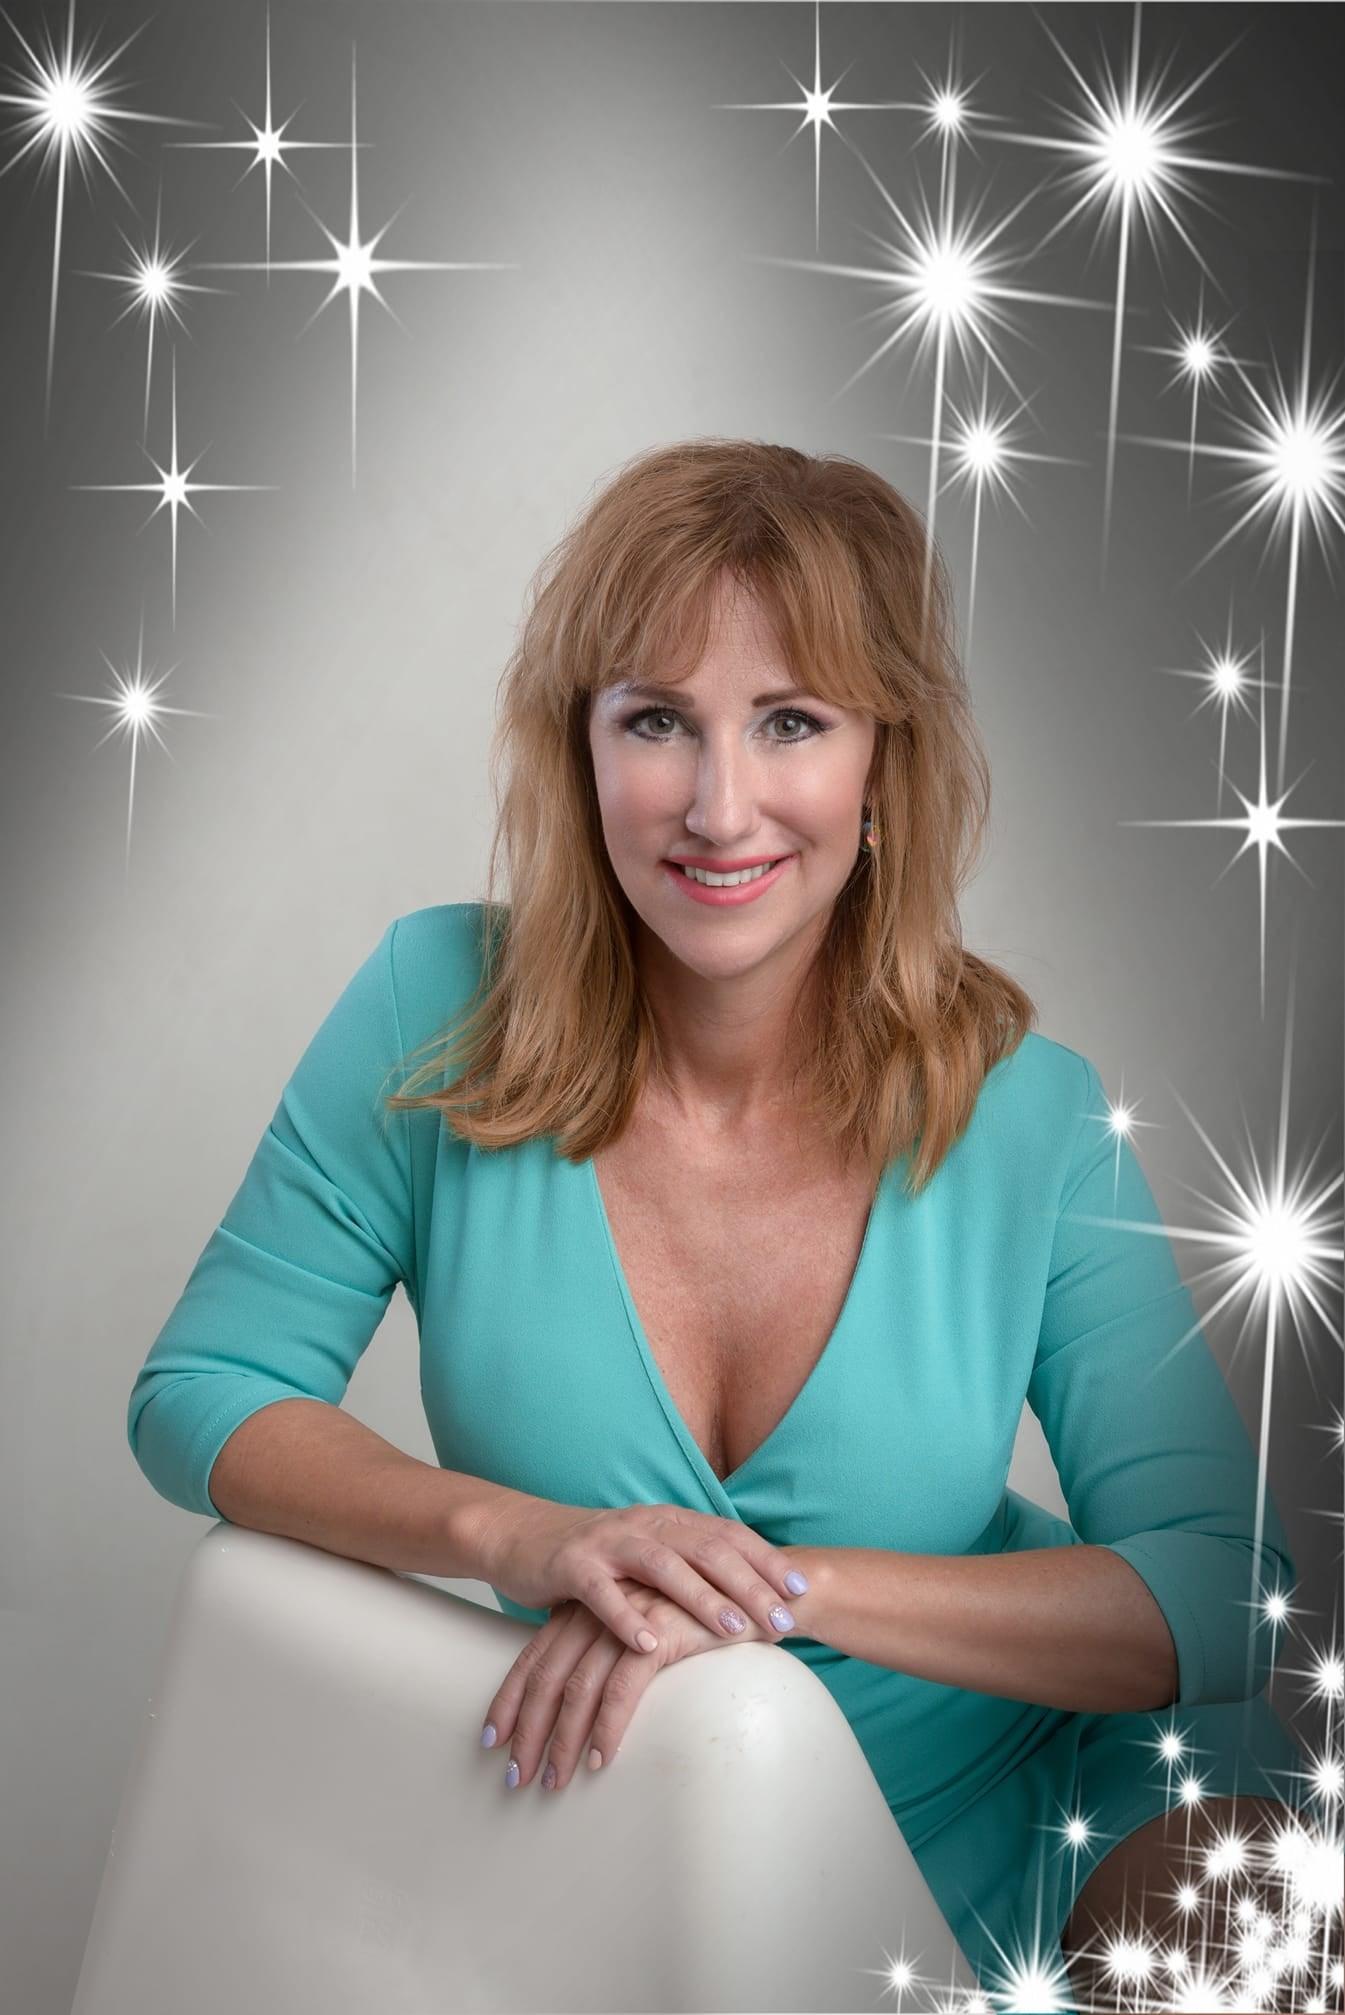 velemenyek-Schlovicsko-Katalin-Mester-sminkes